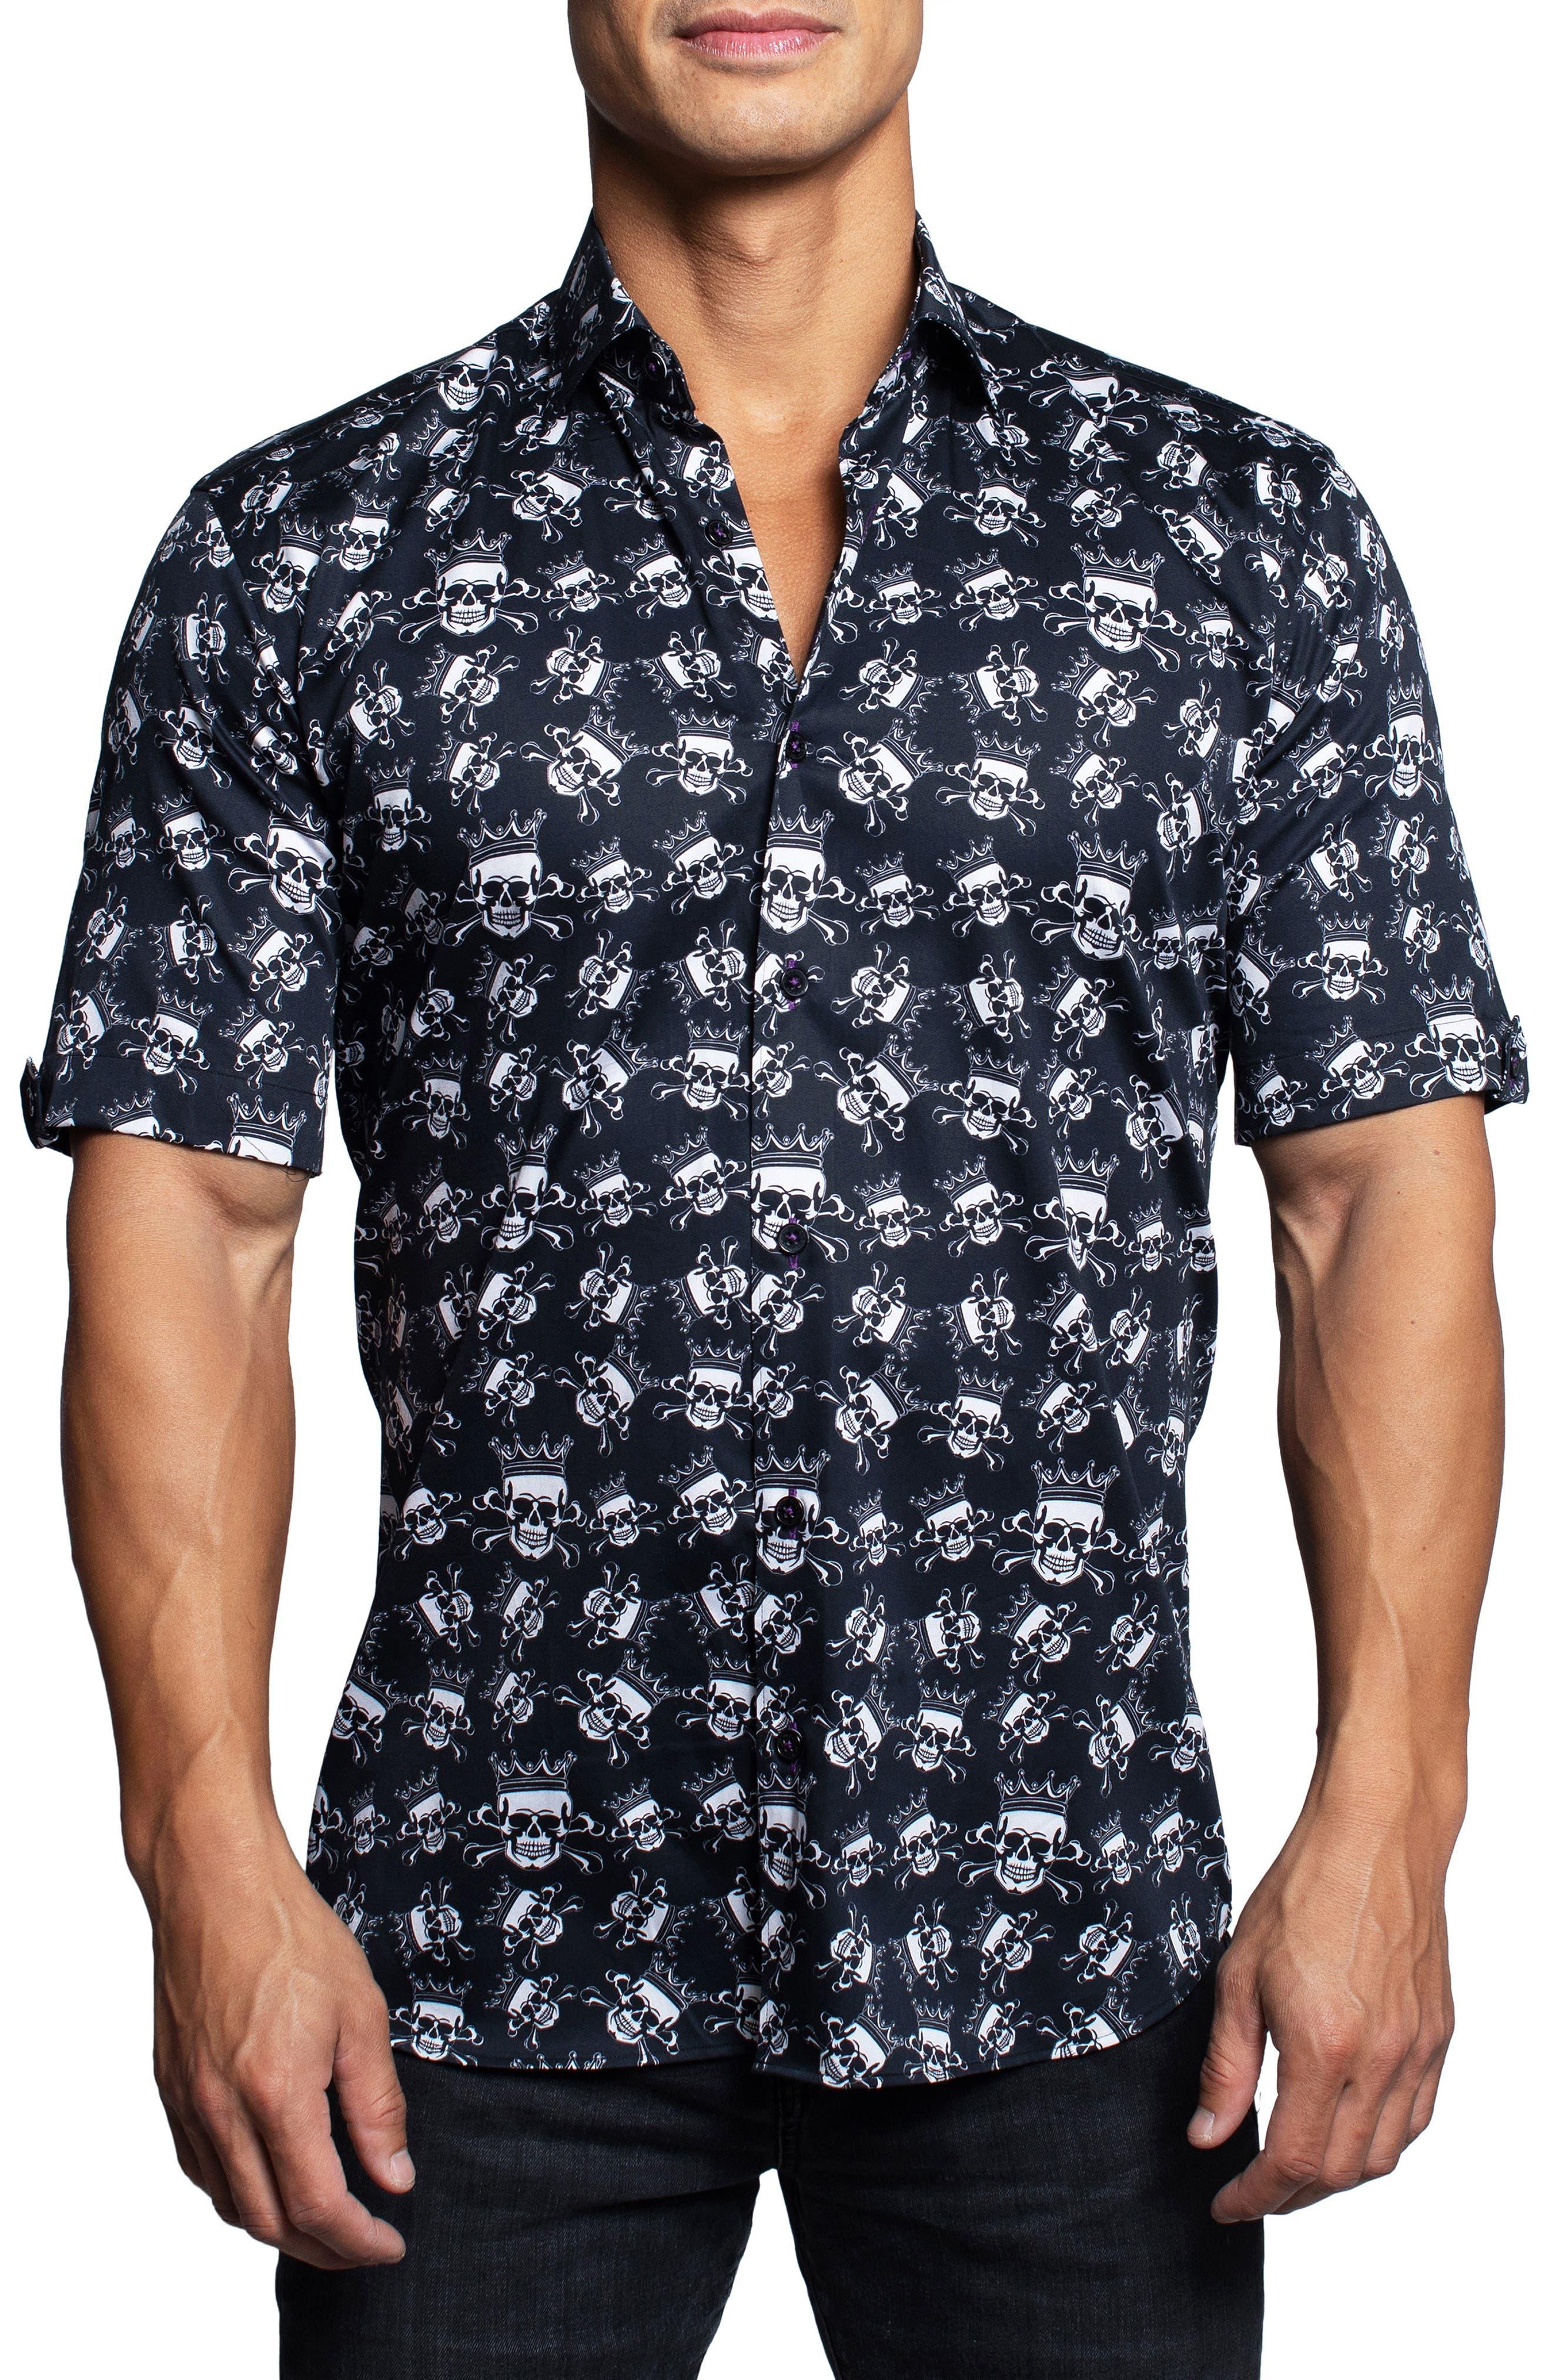 Galileo Skullkiller Black Short Sleeve Button-Up Shirt